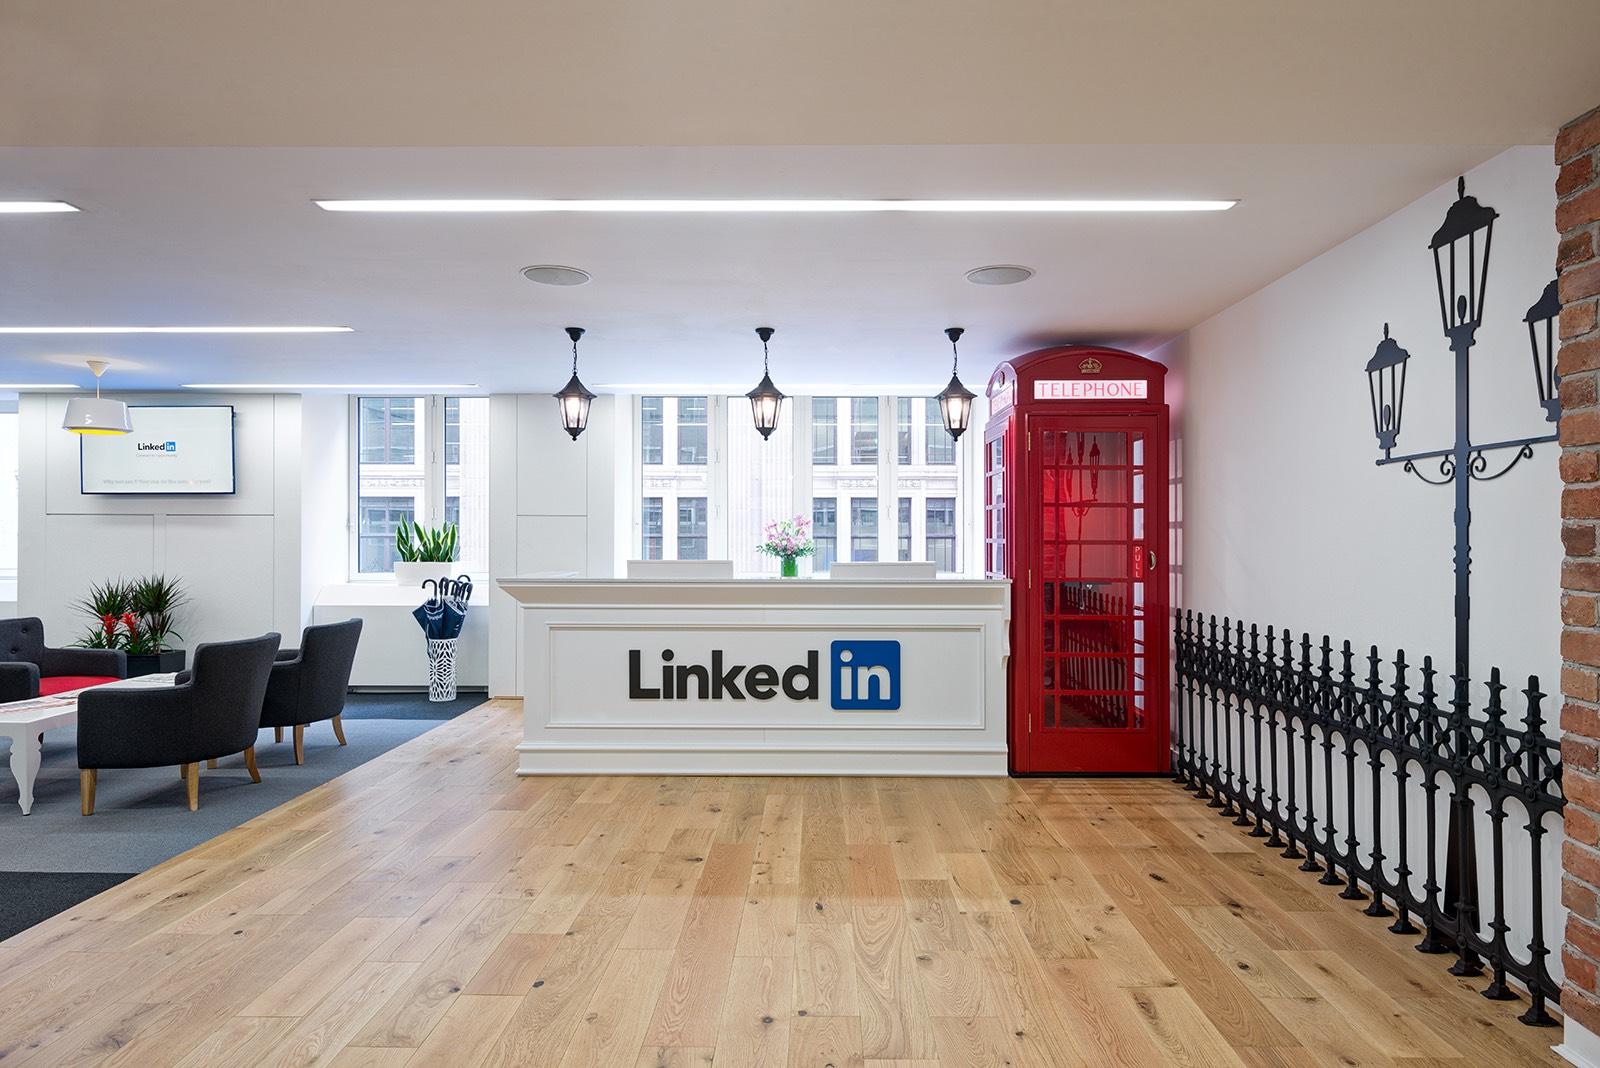 linkedin-office-london-1